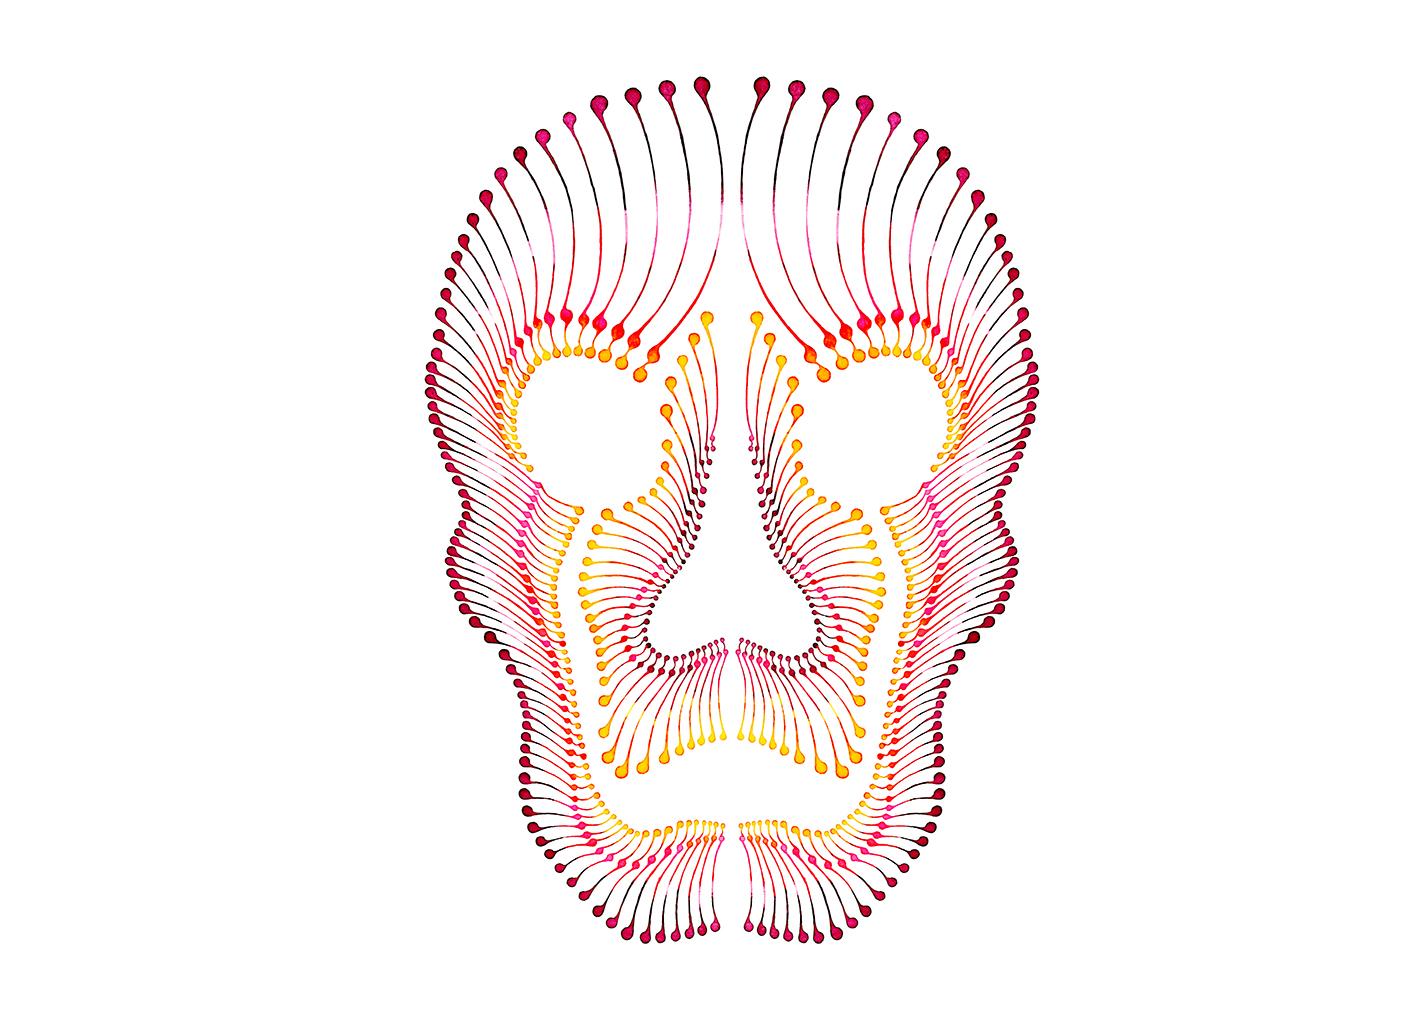 Dotting art Skull V4 / Schädel / Maske – Watercolour painting